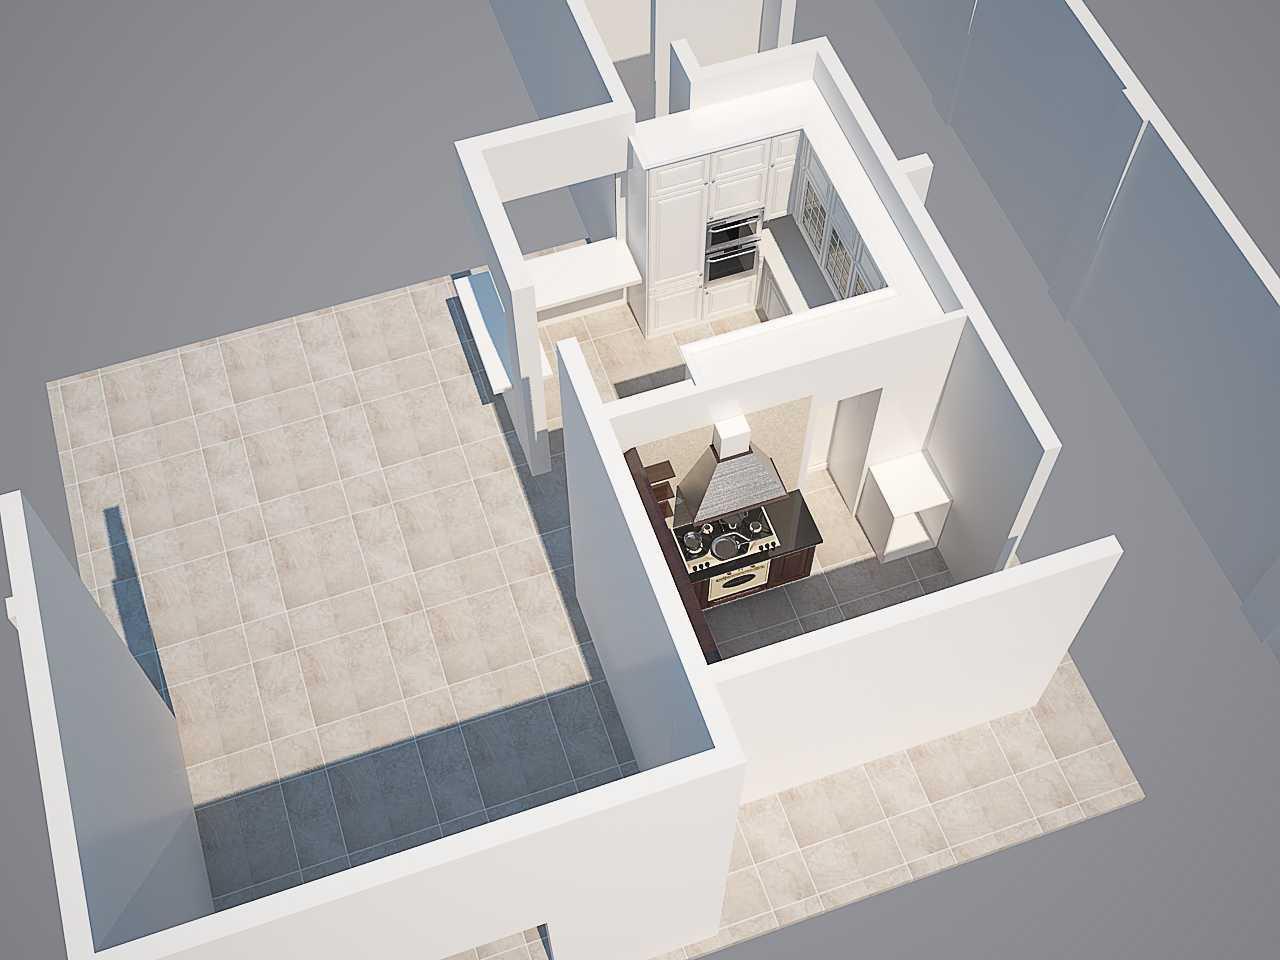 Hive Design & Build Taman Kencana Taman Kencana, Jakarta Barat Taman Kencana, Jakarta Barat Plan-Kitchen-And-Pantry Modern 25925